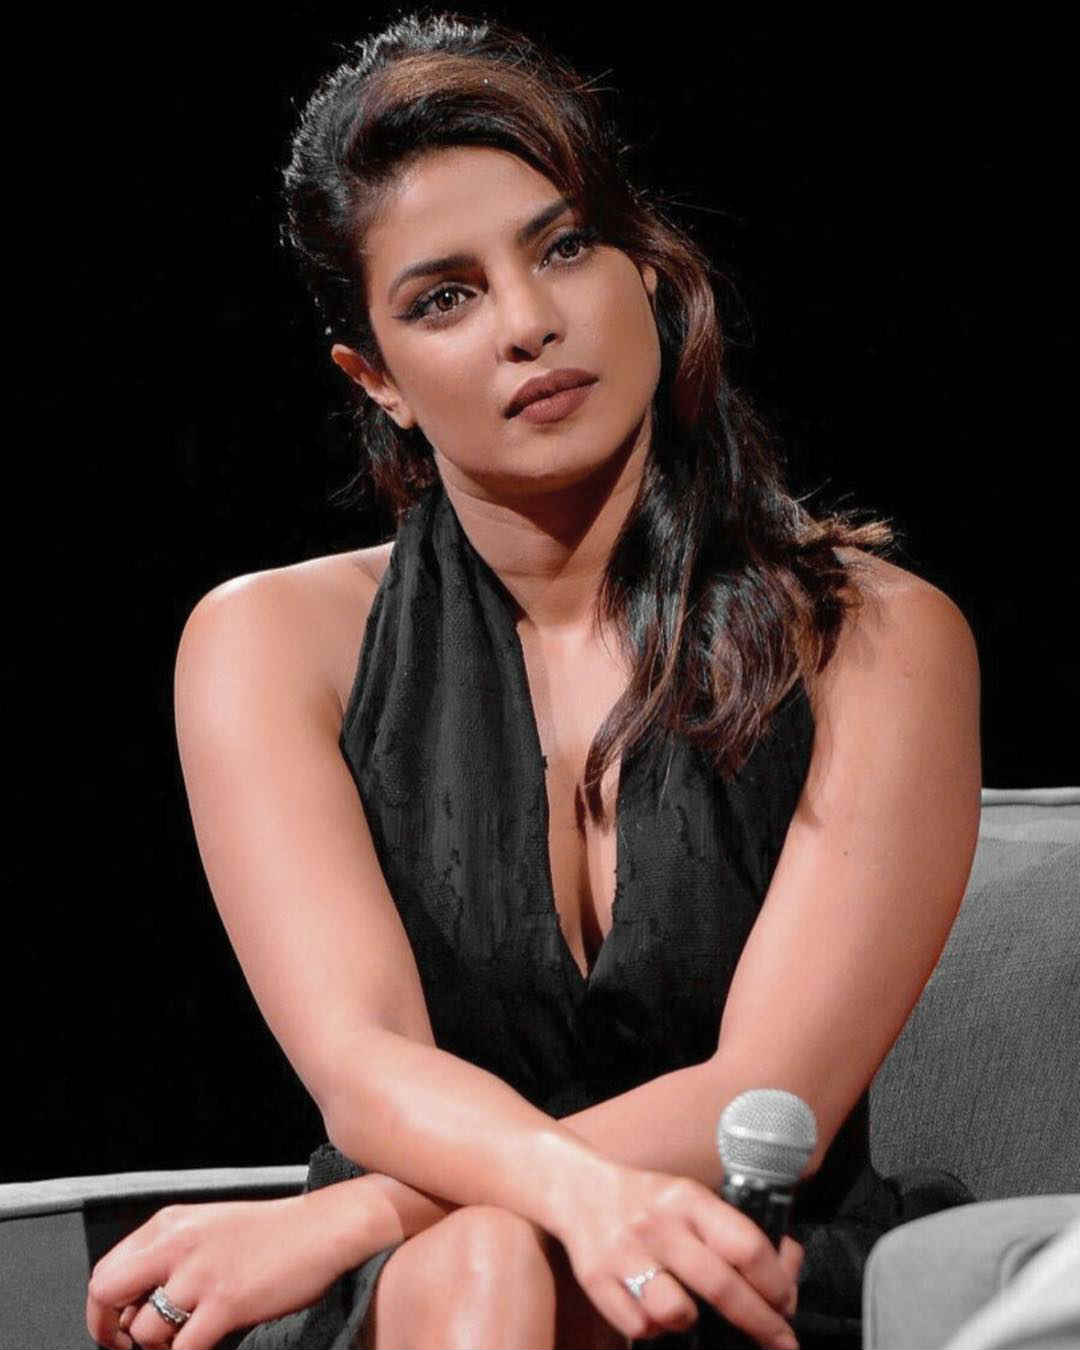 Priyanka Chopra at the Toronto International Film Festival